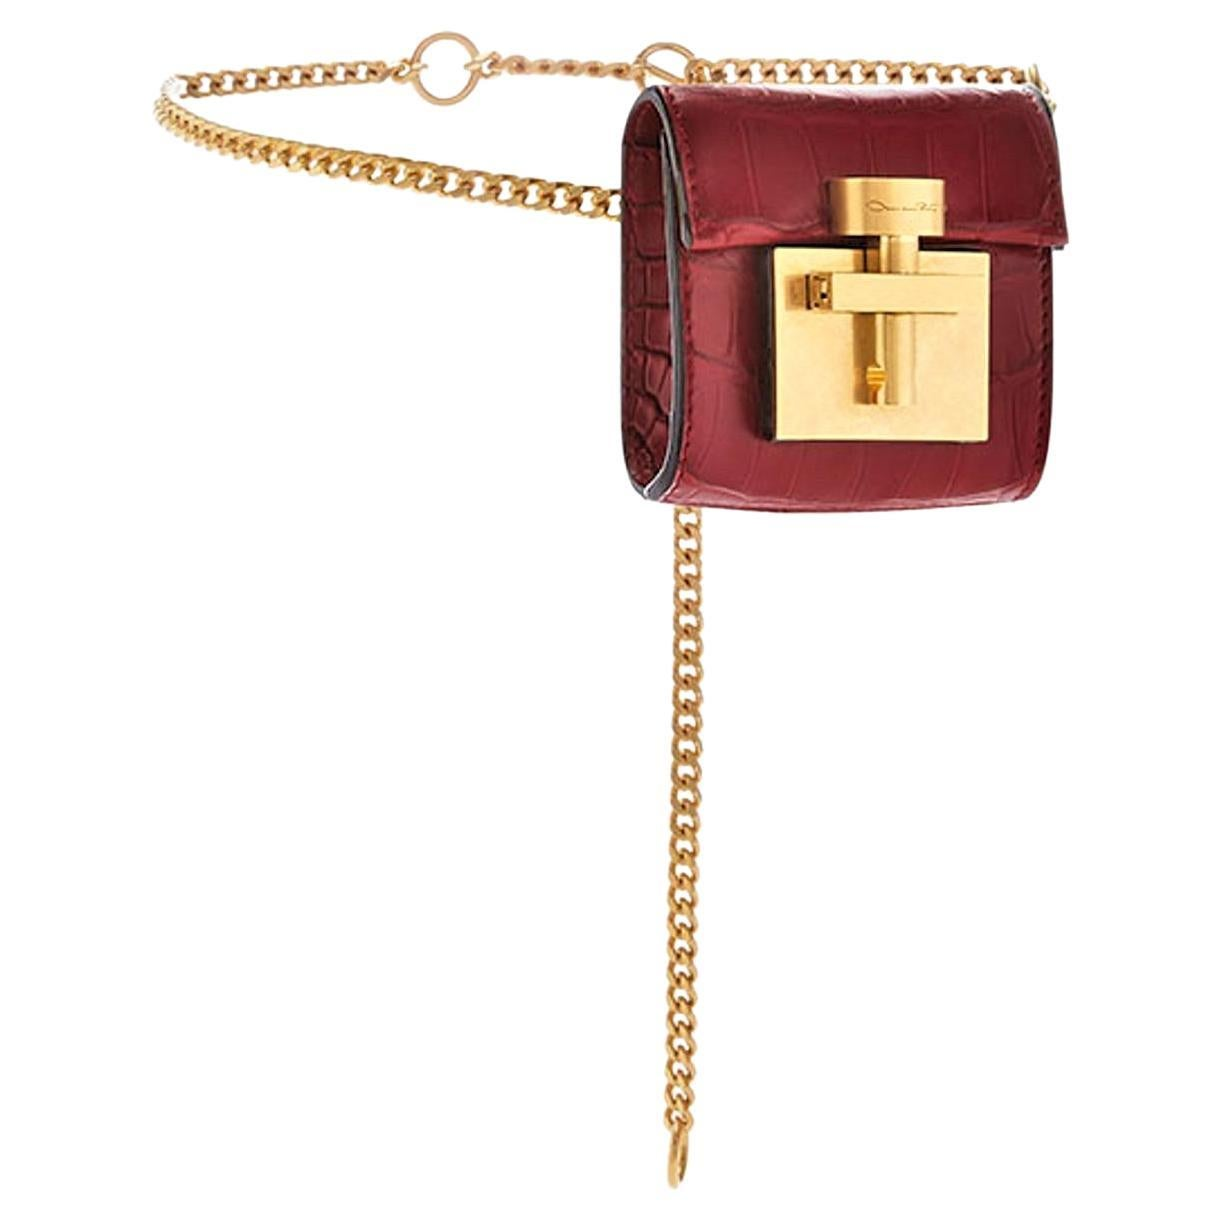 New $4290 Oscar De La Renta Red Alligator Alibi Belt Bag & Cross Body Bag